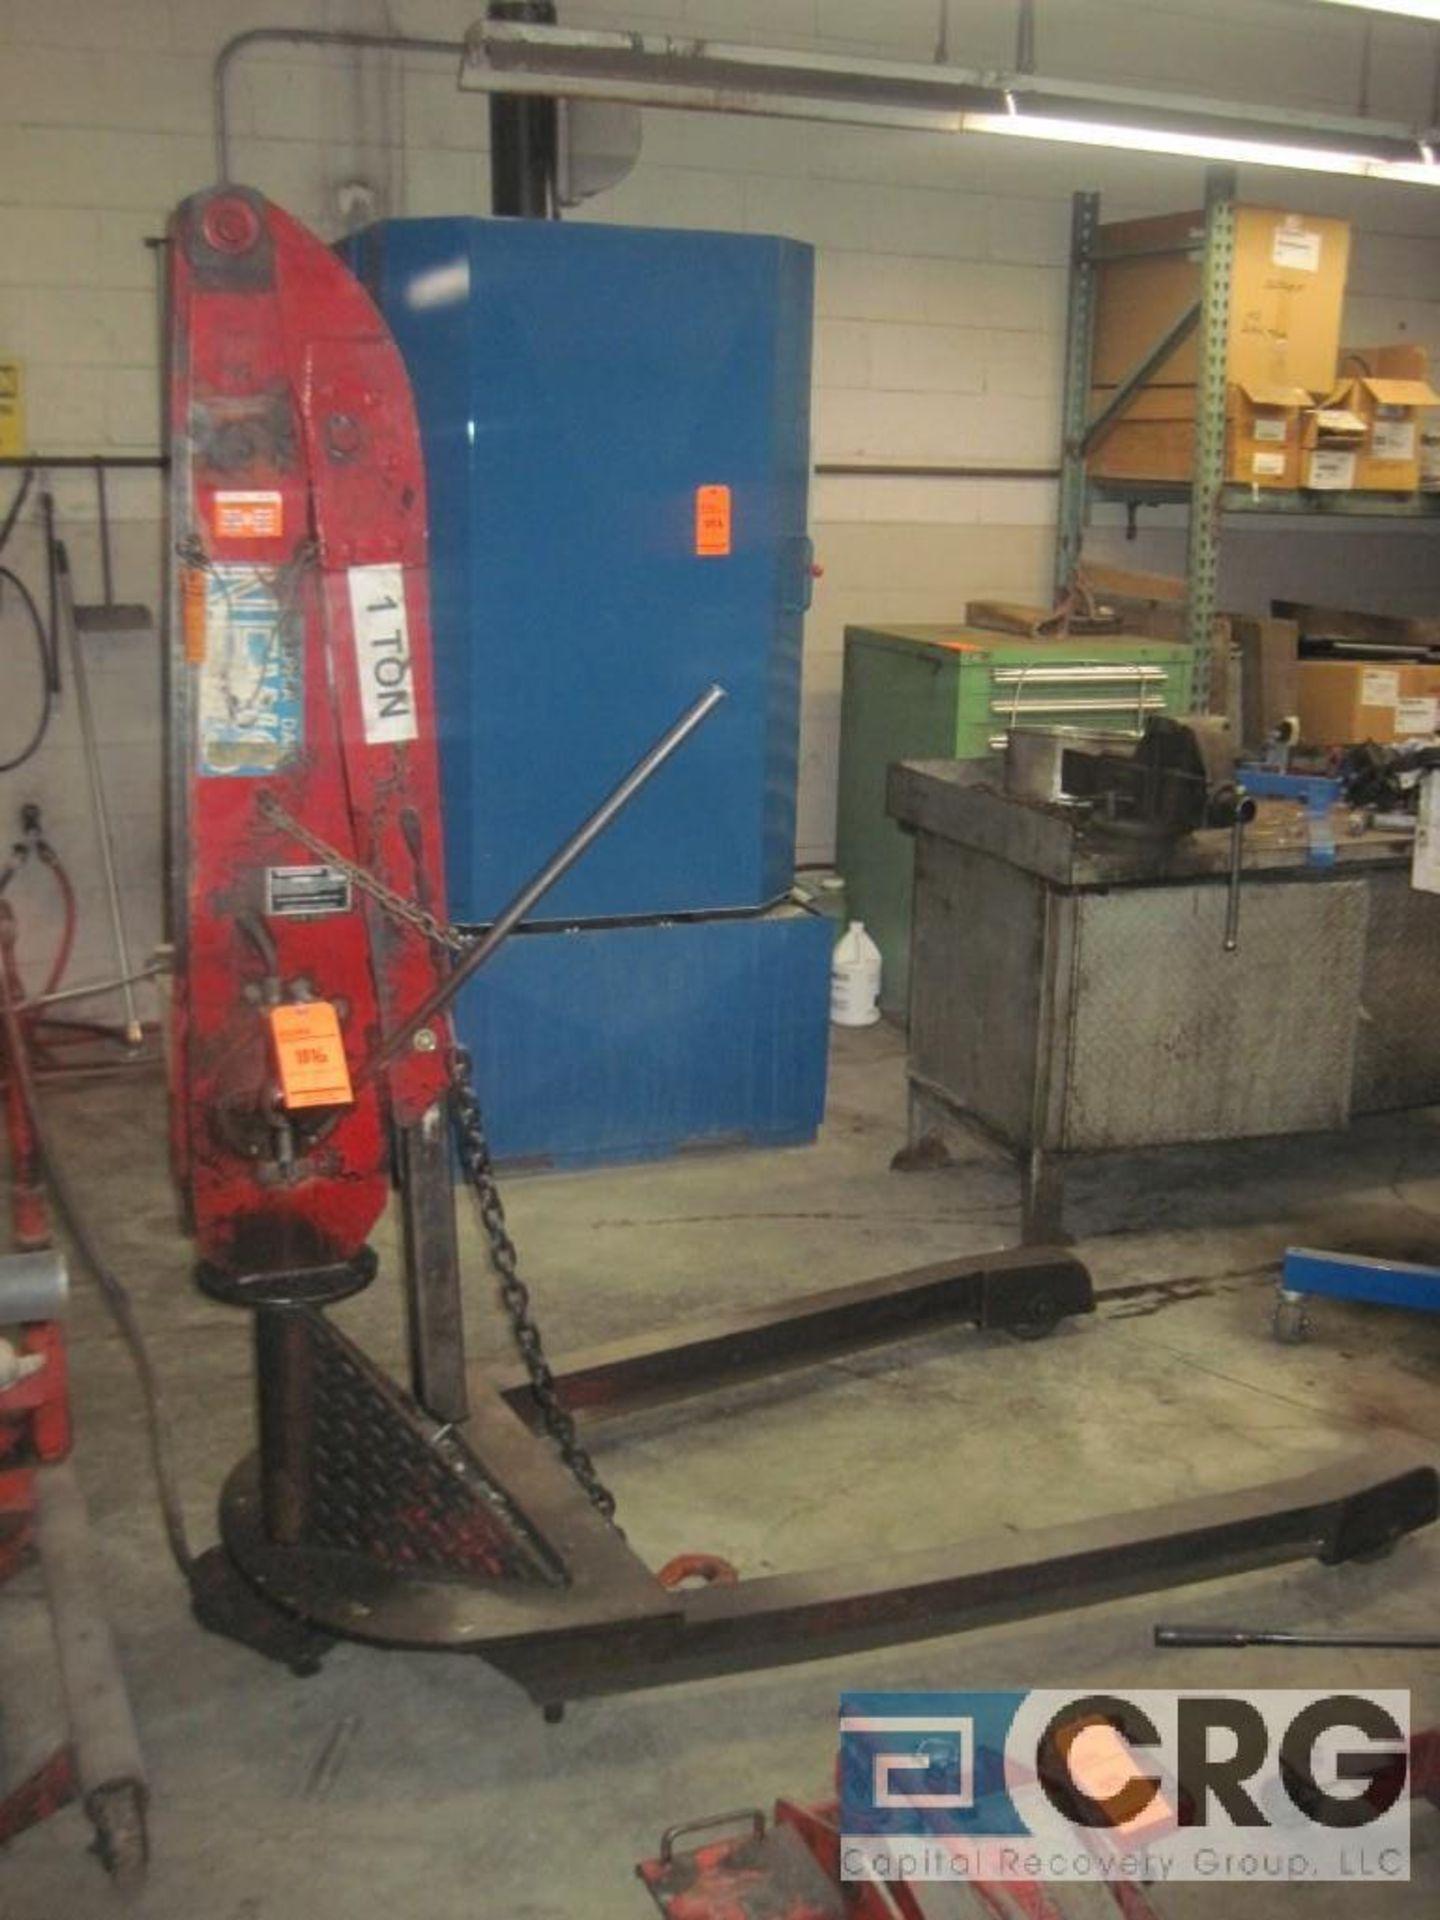 Black Hawk MC 2000 hydraulic hoist, 1 ton cap., s/n 832